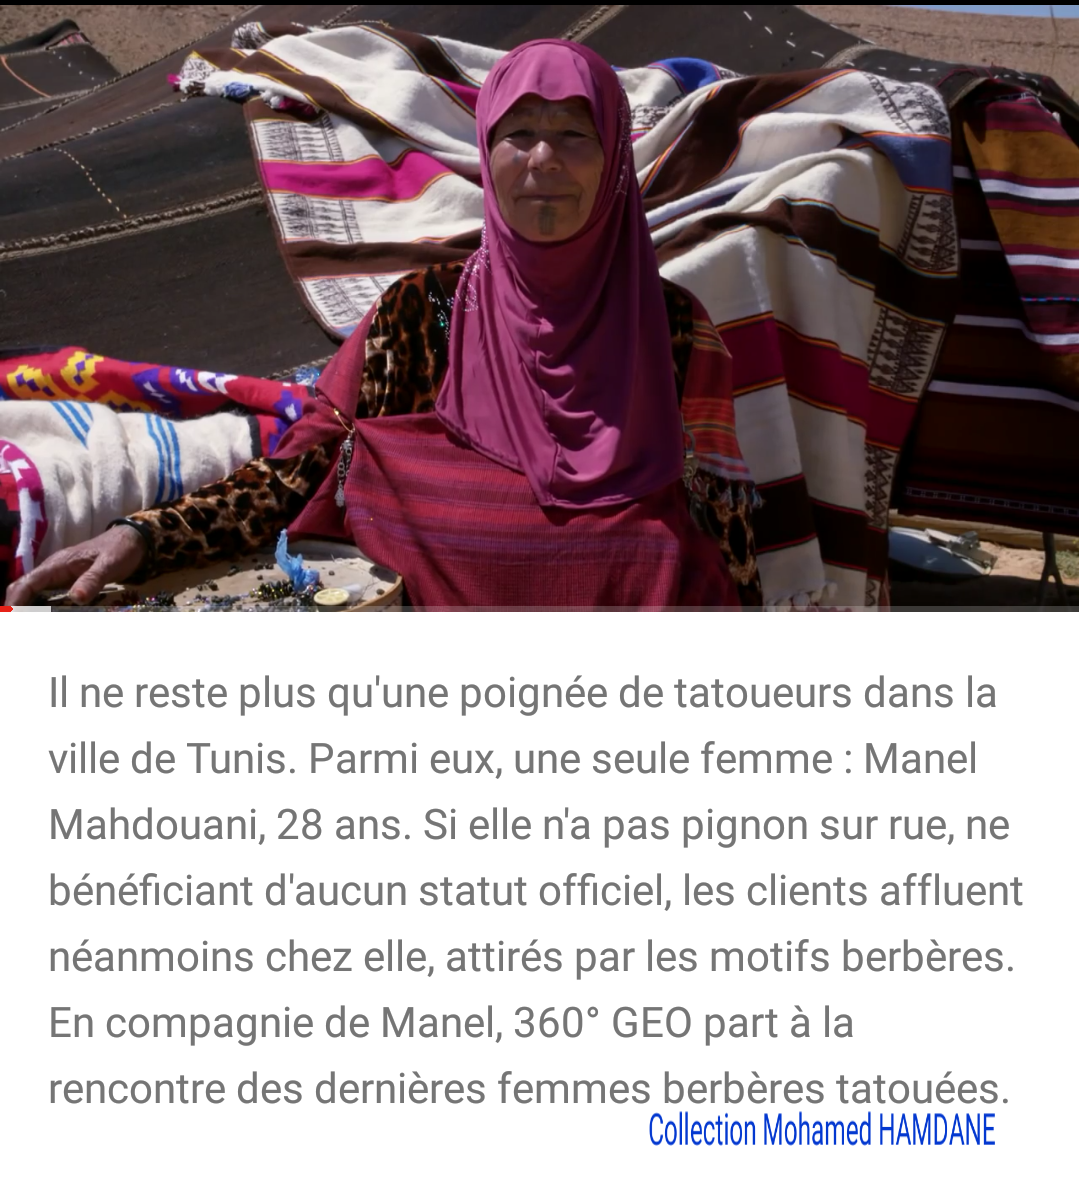 Culture Et Patrimoine De Tunisie En Images Mohamed Hamdane ثقافة